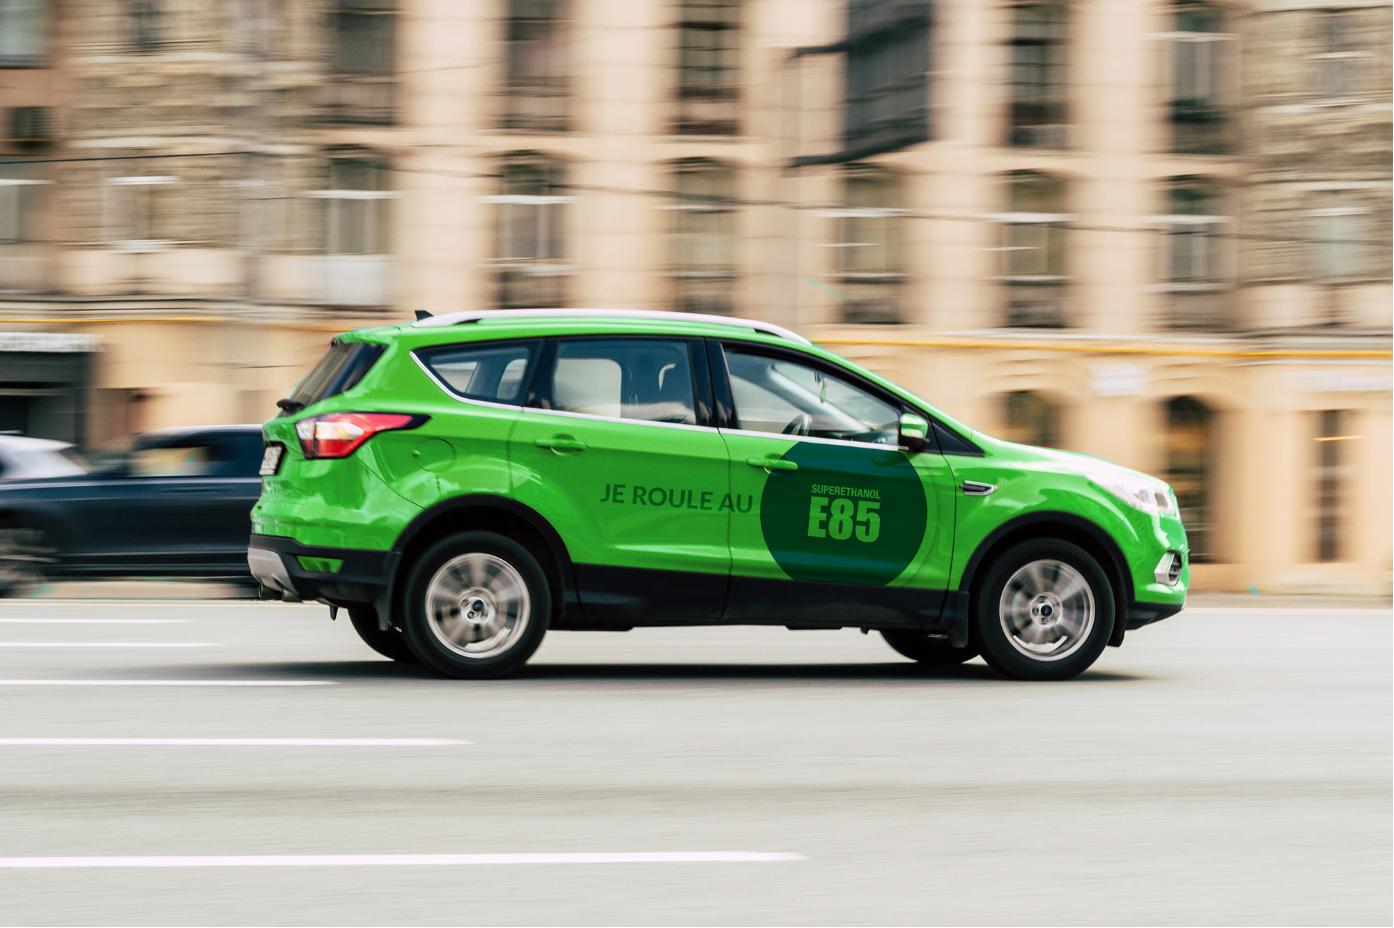 voiture-verte-E85